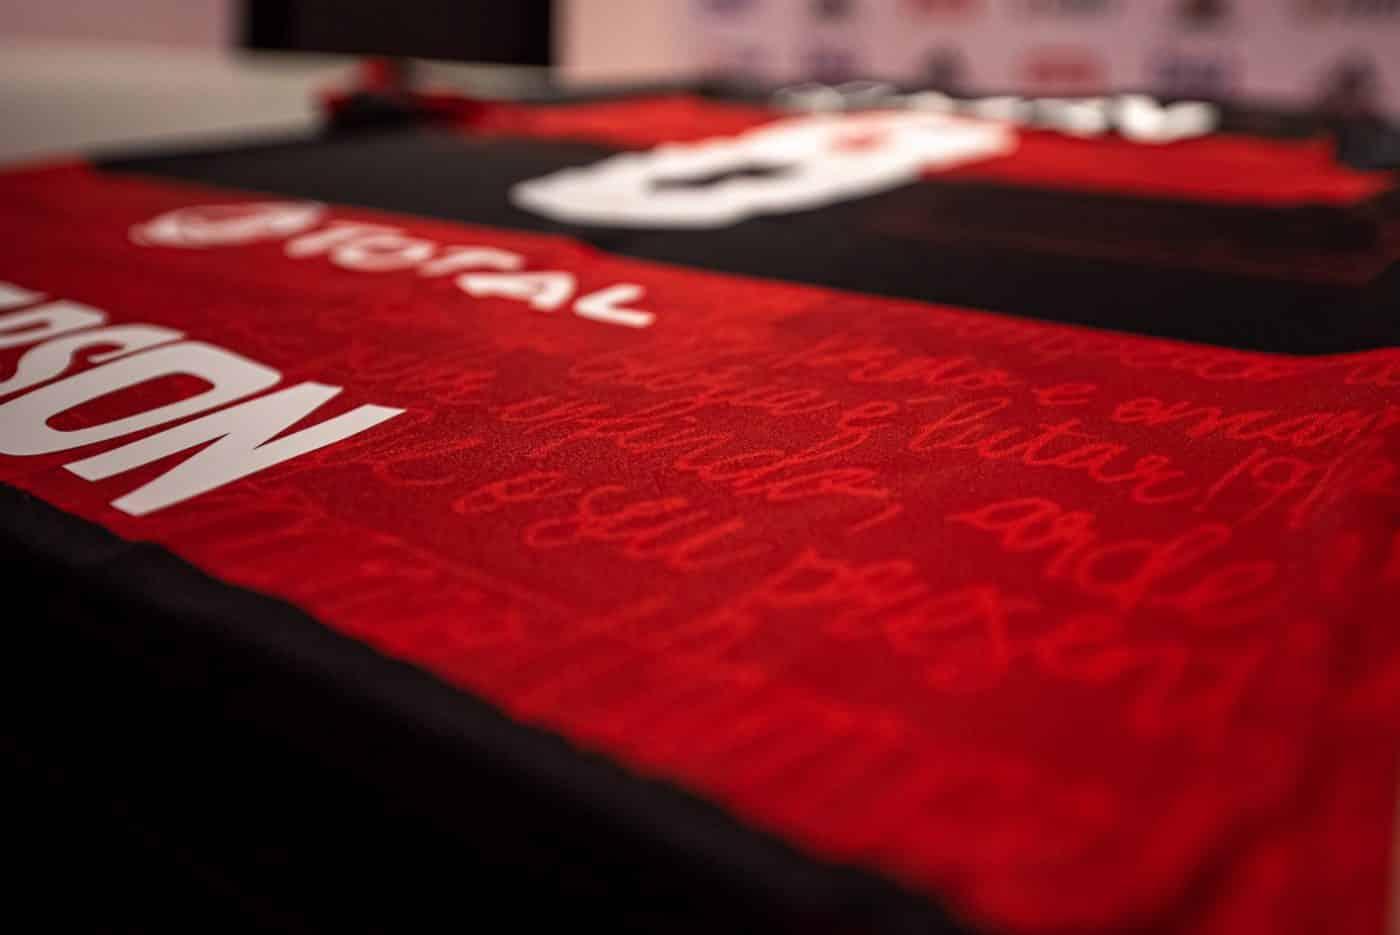 maillot-adidas-flamengo-2020-2021-7